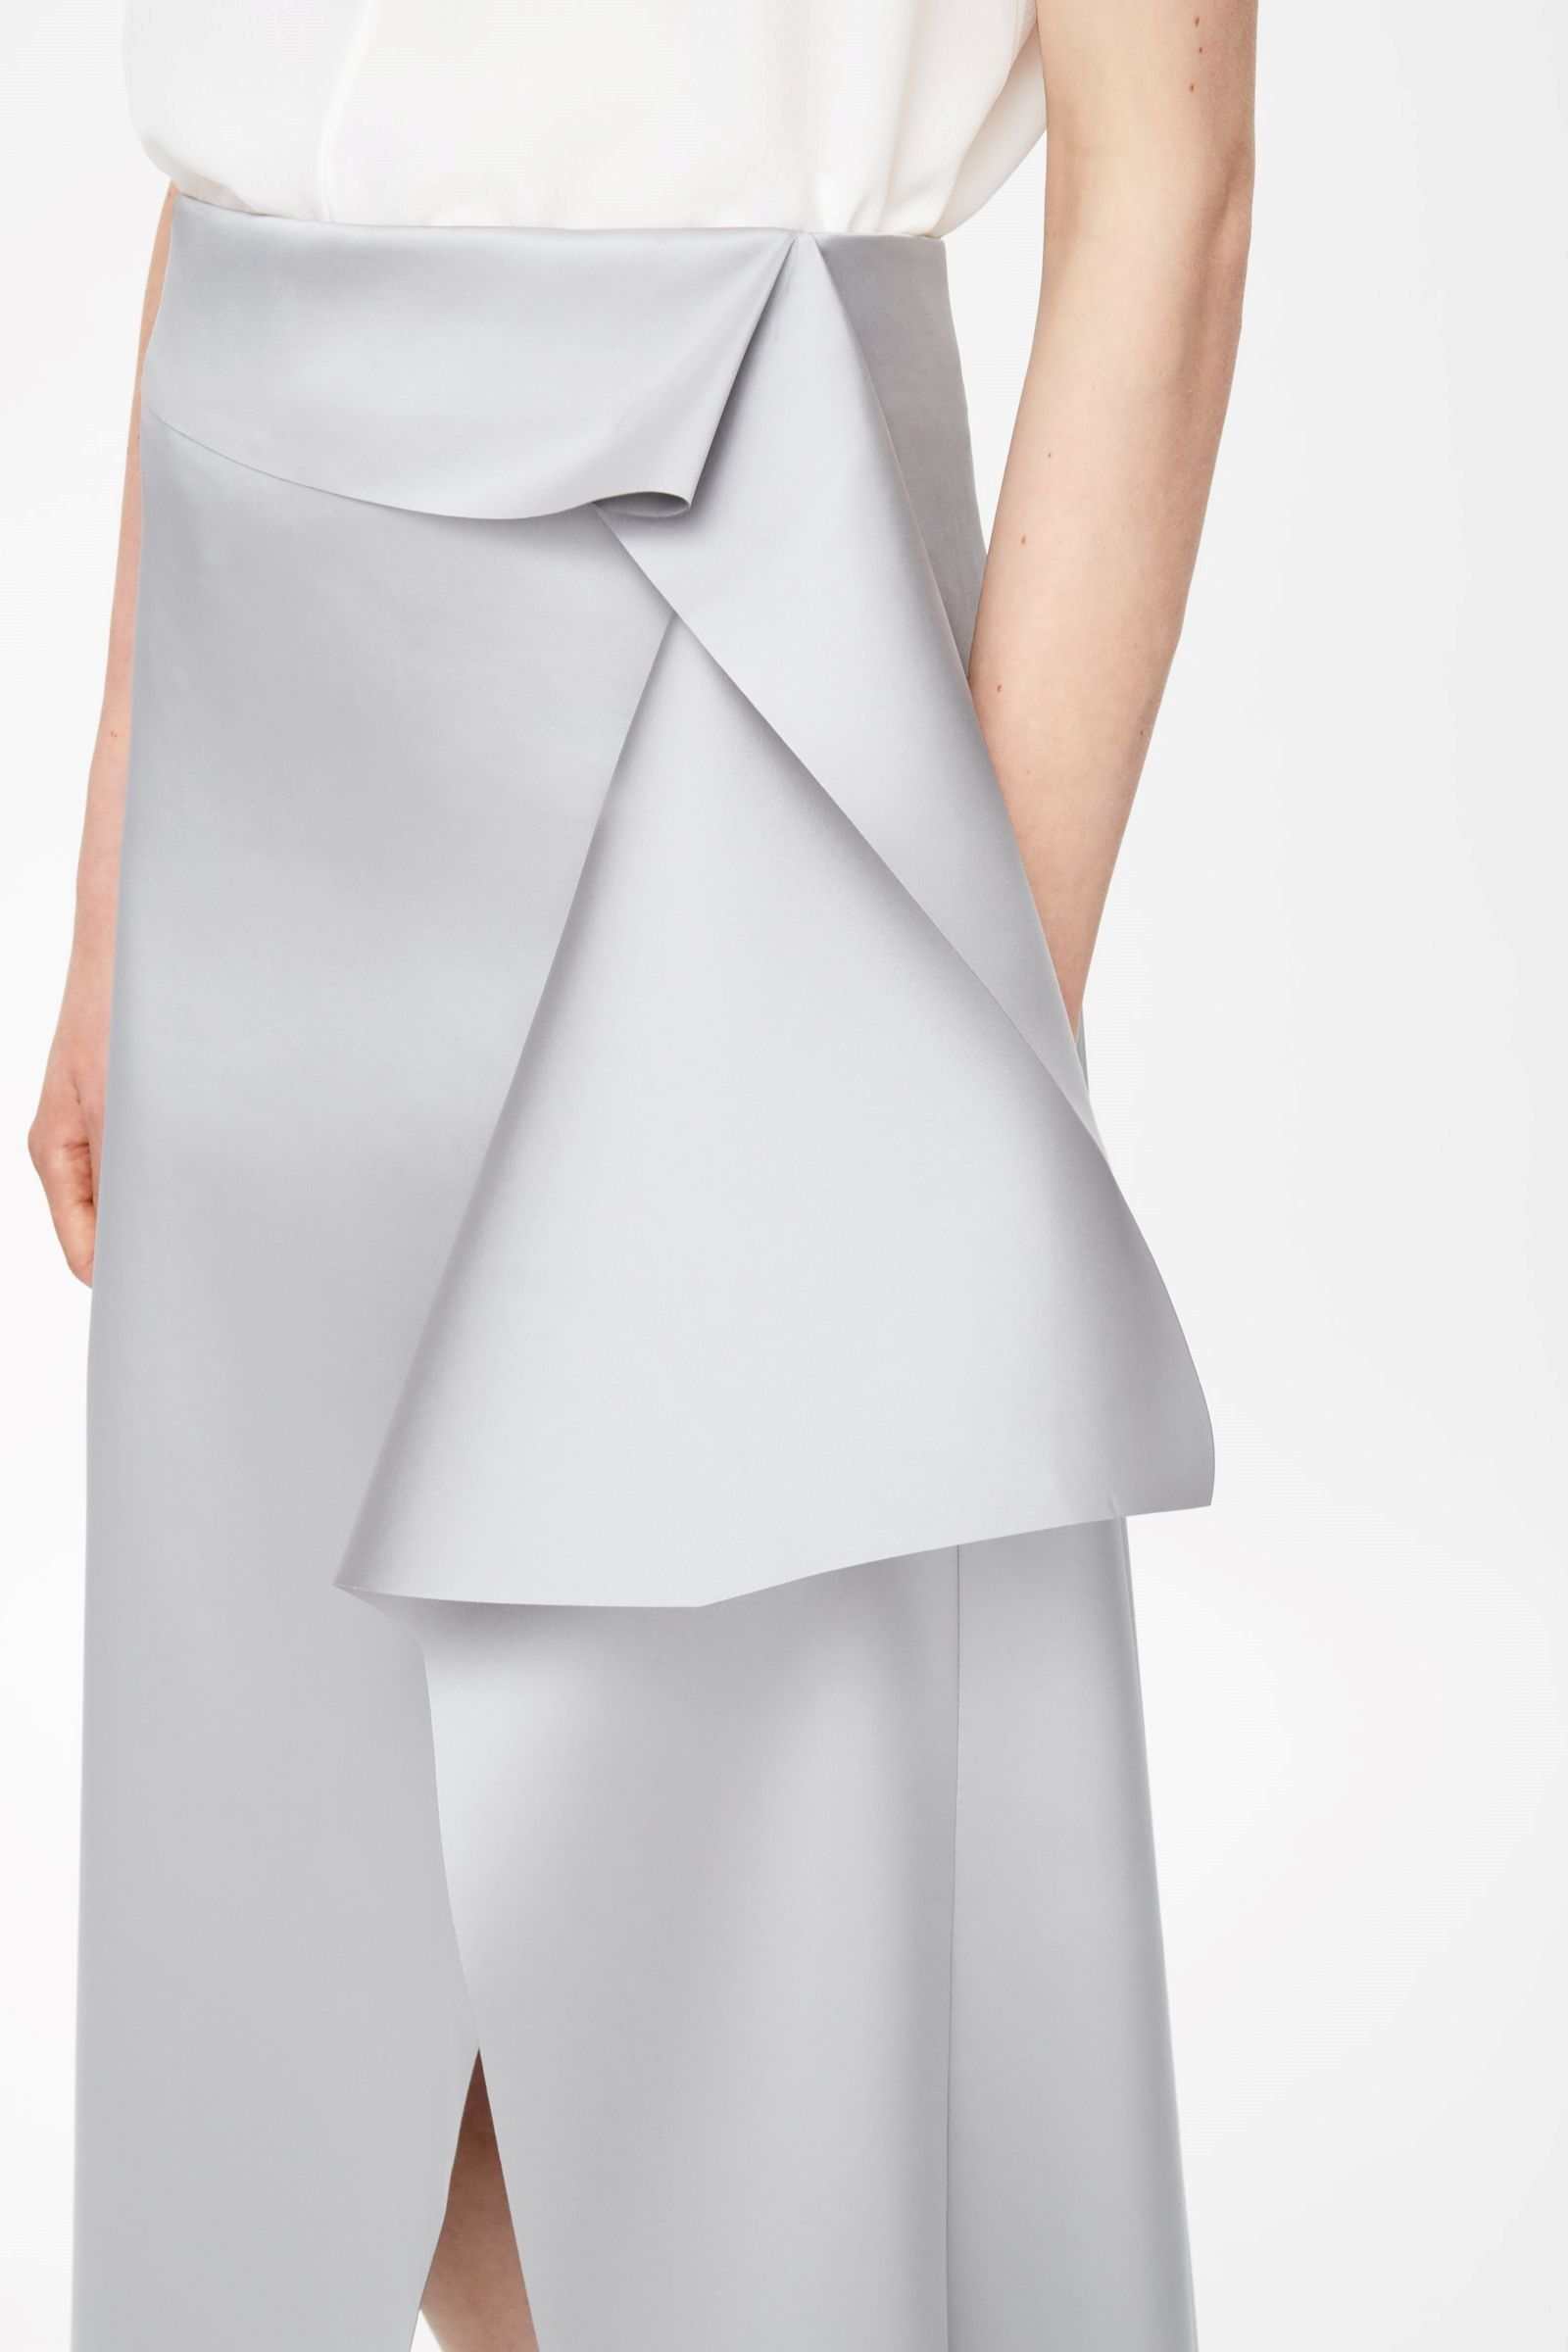 max by draped heathered studio hindigo uk jersey linen drapes skirt